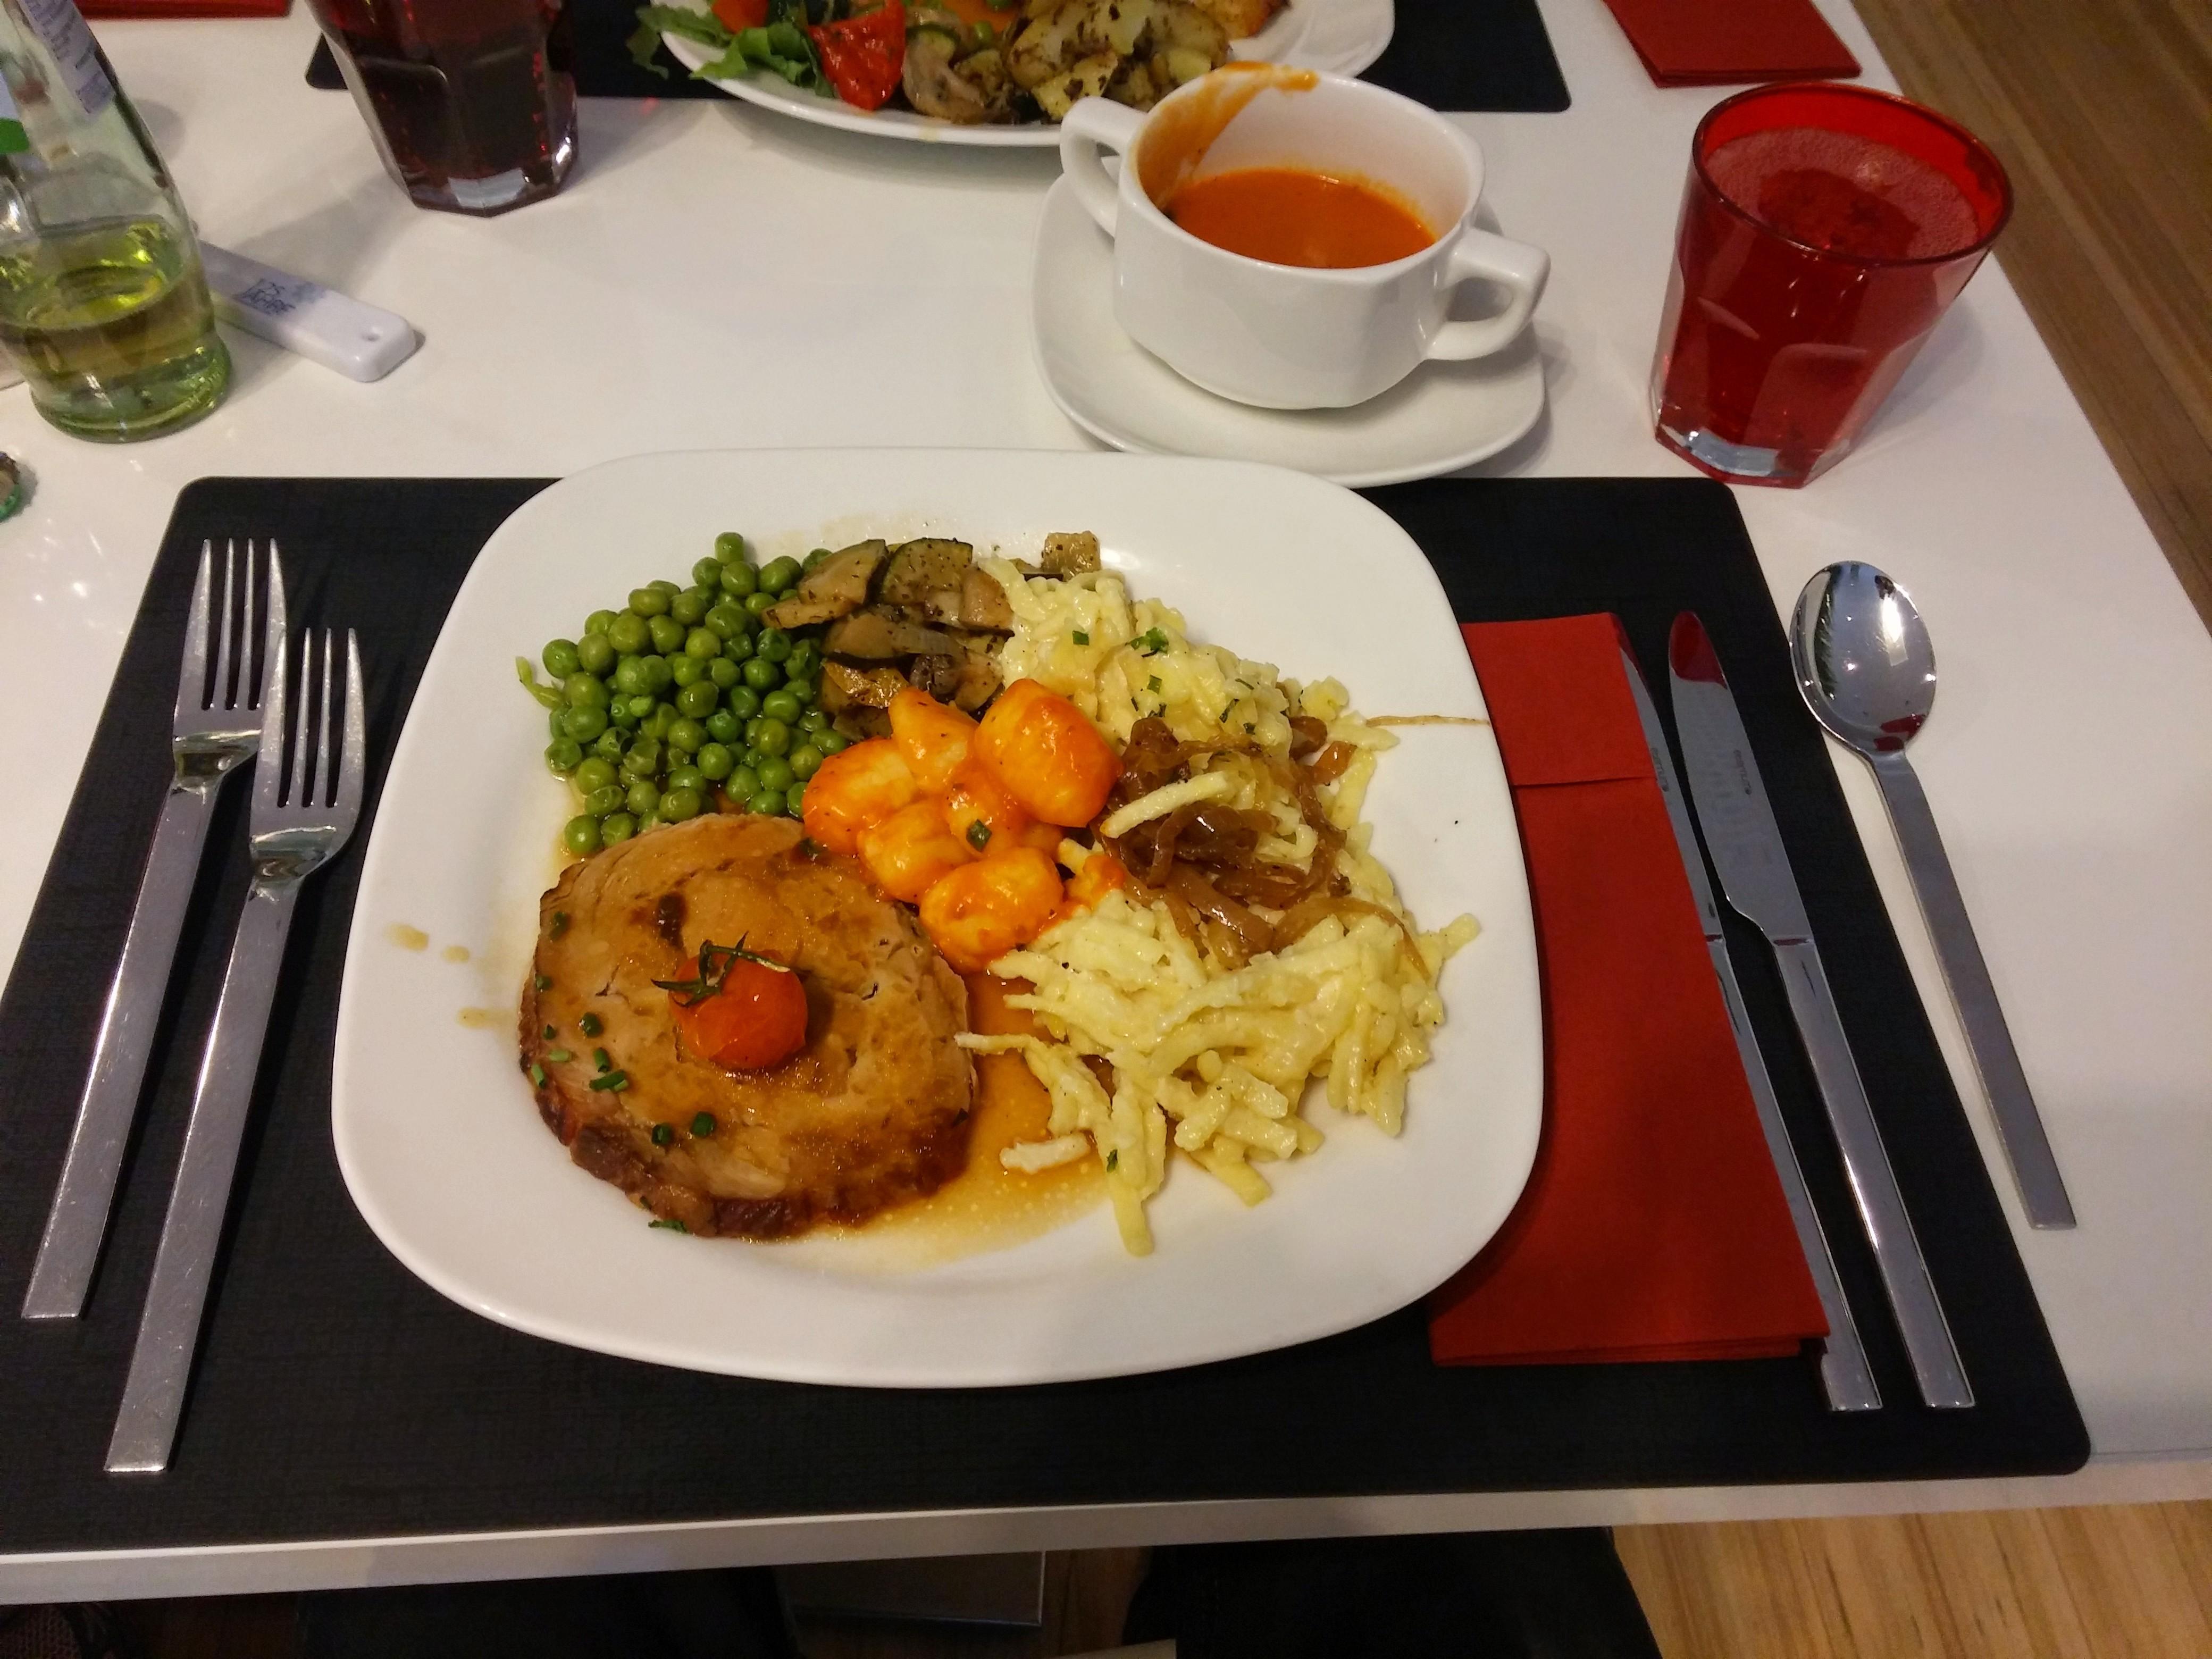 http://foodloader.net/nico_2015-05-19_braten-mit-kaesespaetzle-und-gemuese.jpg